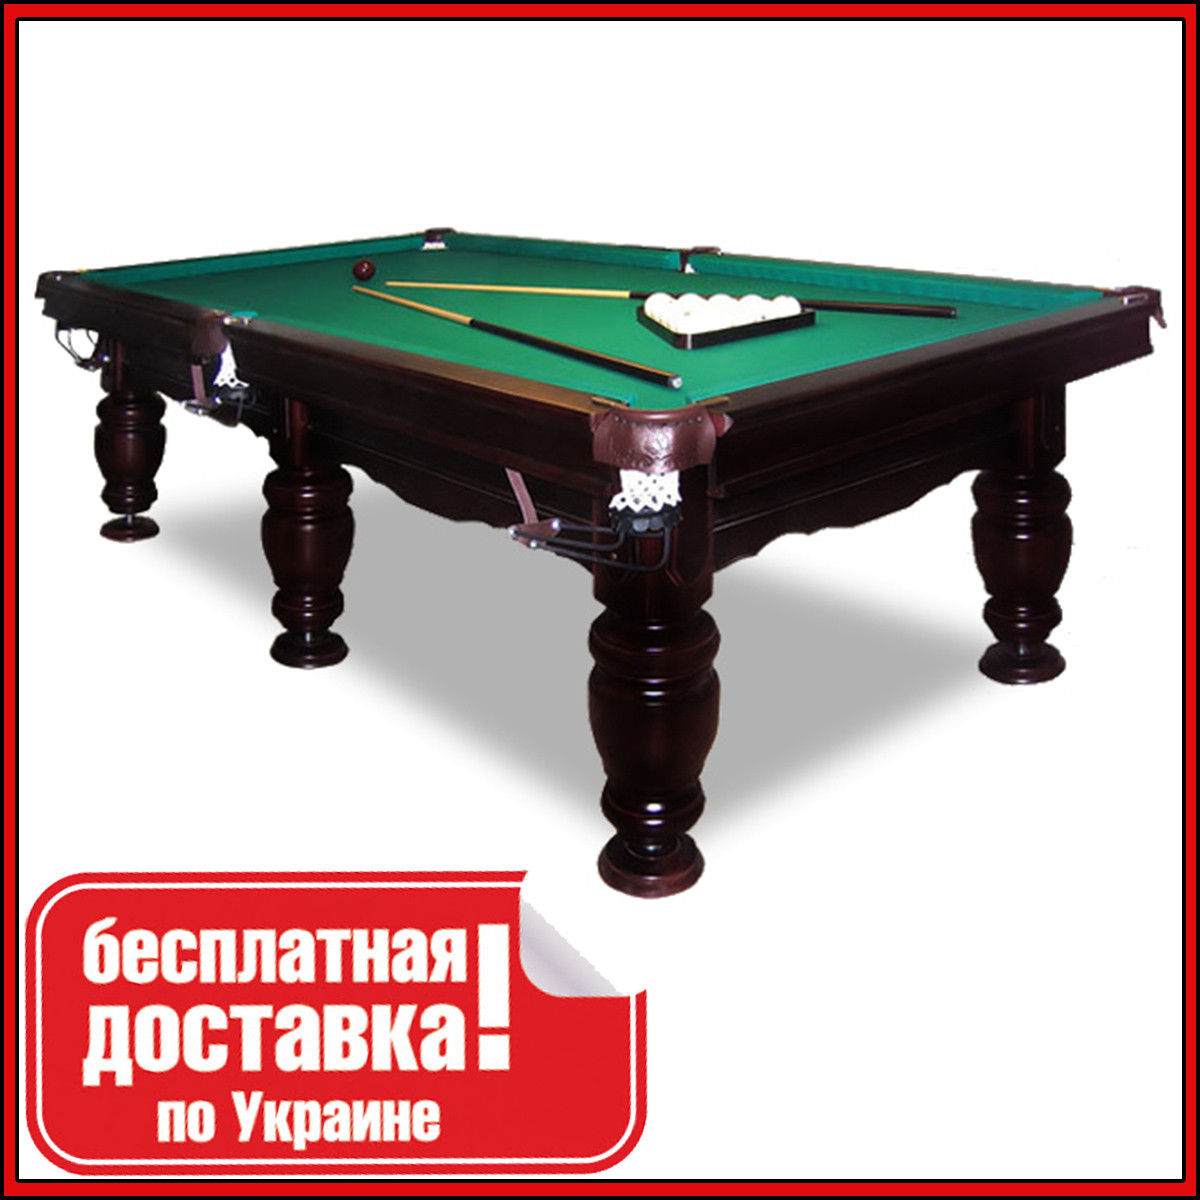 Бильярдный стол для пула ФЕРЗЬ 9 футов Ардезия 2.6 м х 1.3 м из натурального дерева